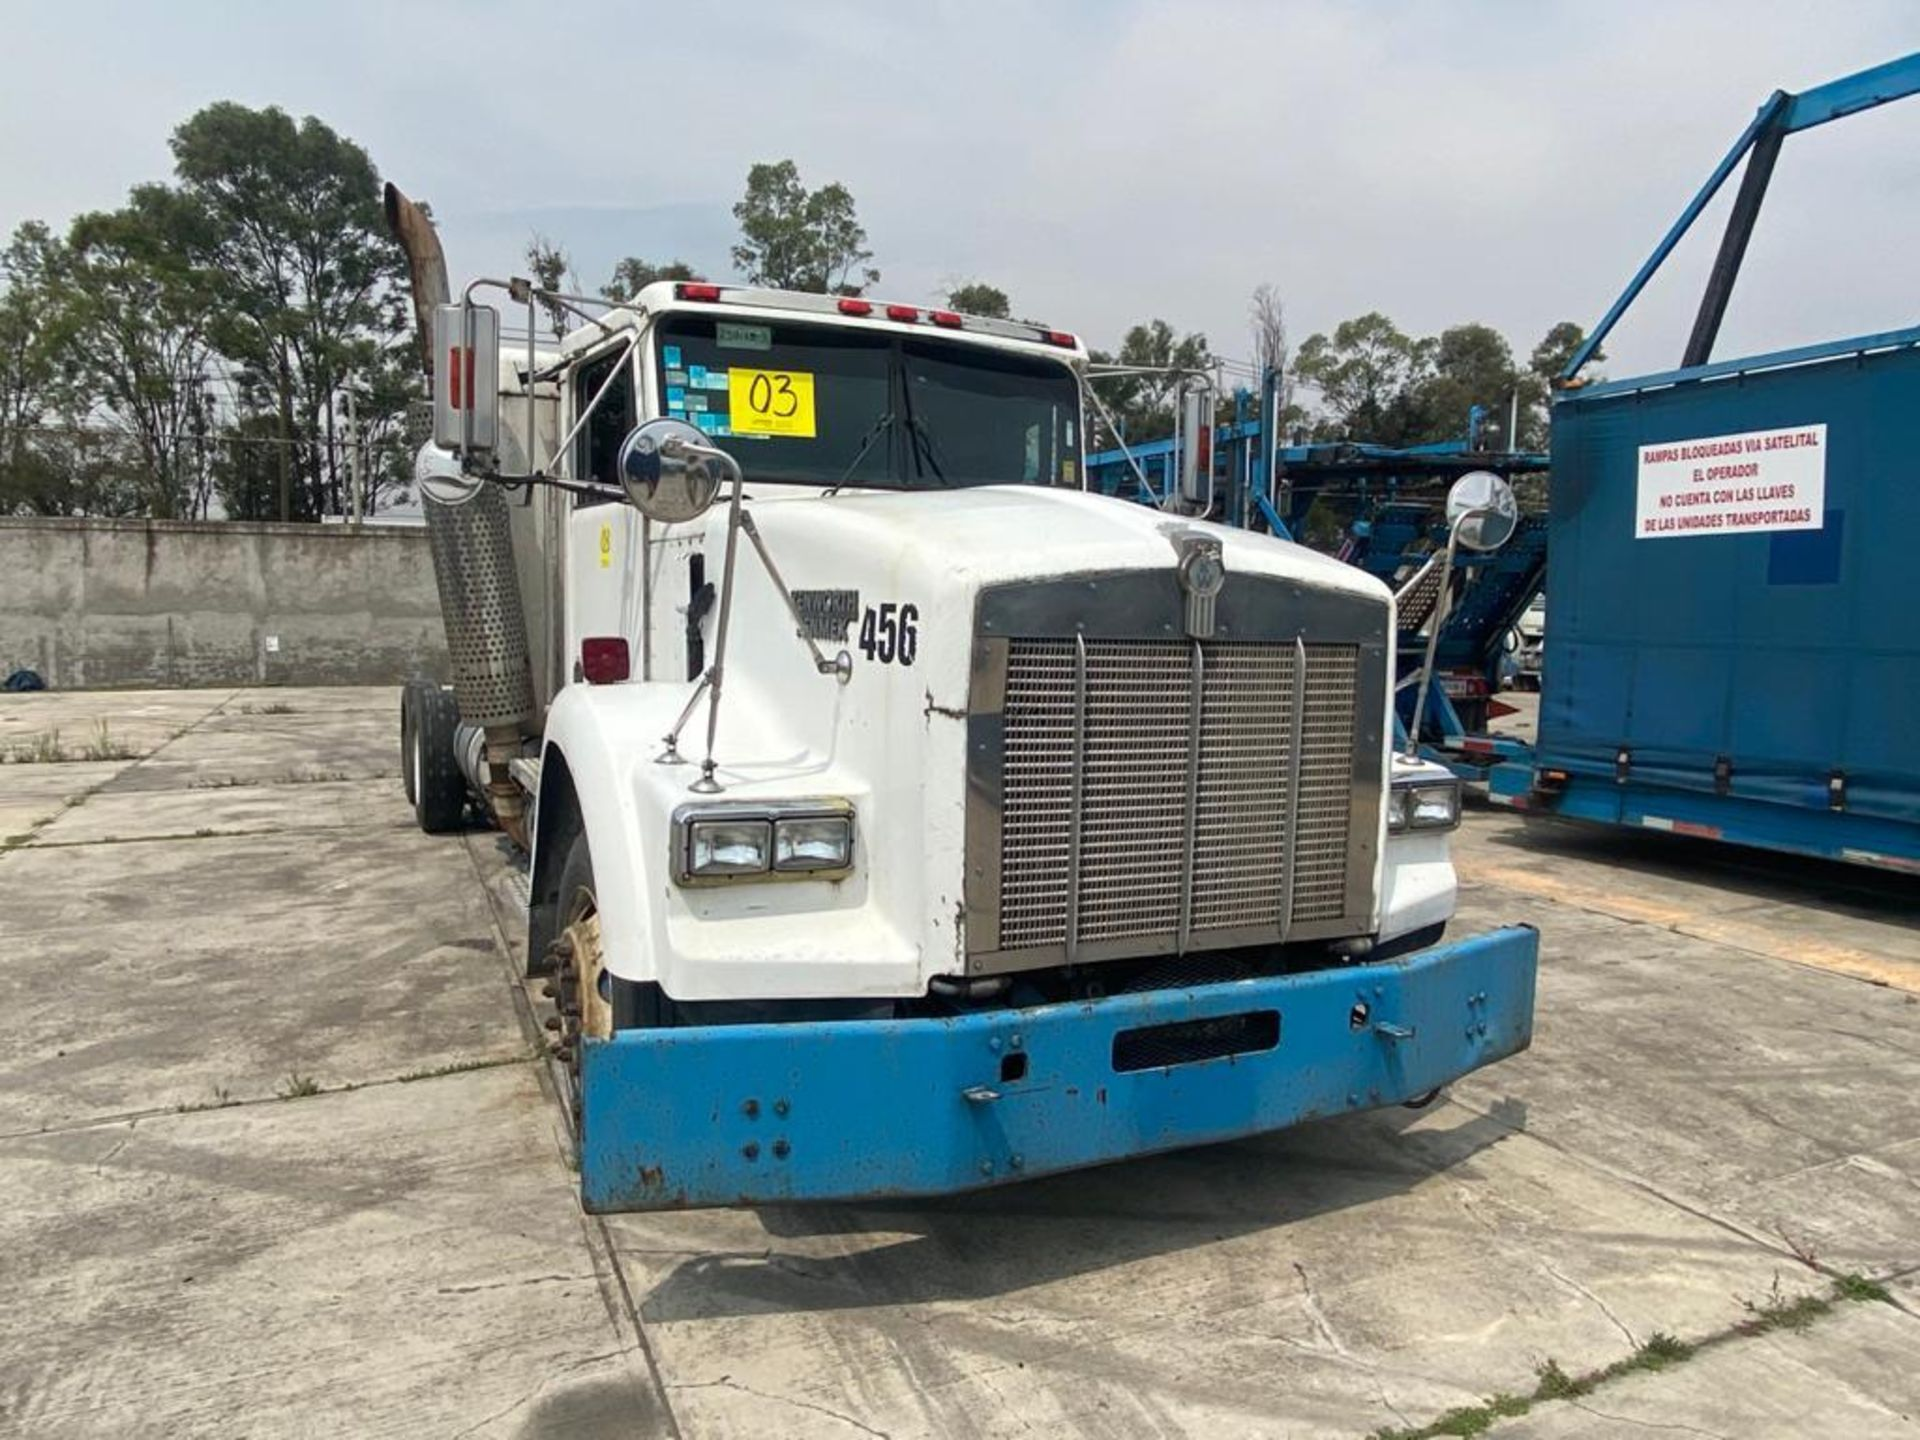 1999 Kenworth Sleeper truck tractor, standard transmission of 18 speeds - Image 3 of 62